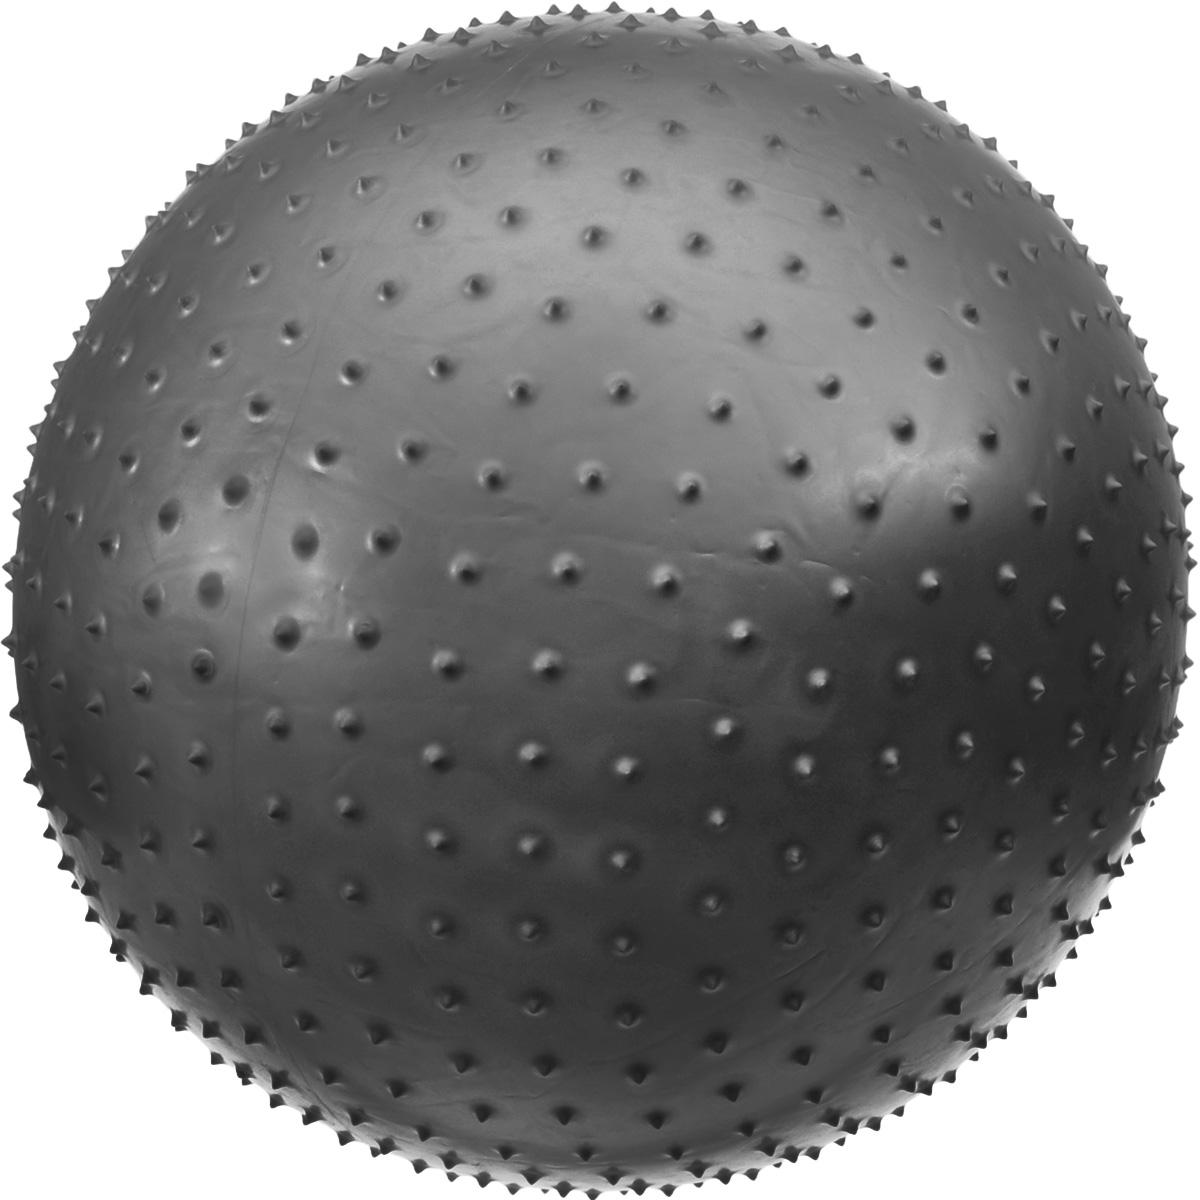 Мяч для фитнеса Bradex, массажный, 75 см мяч для фитнеса bradex массажный 75 см